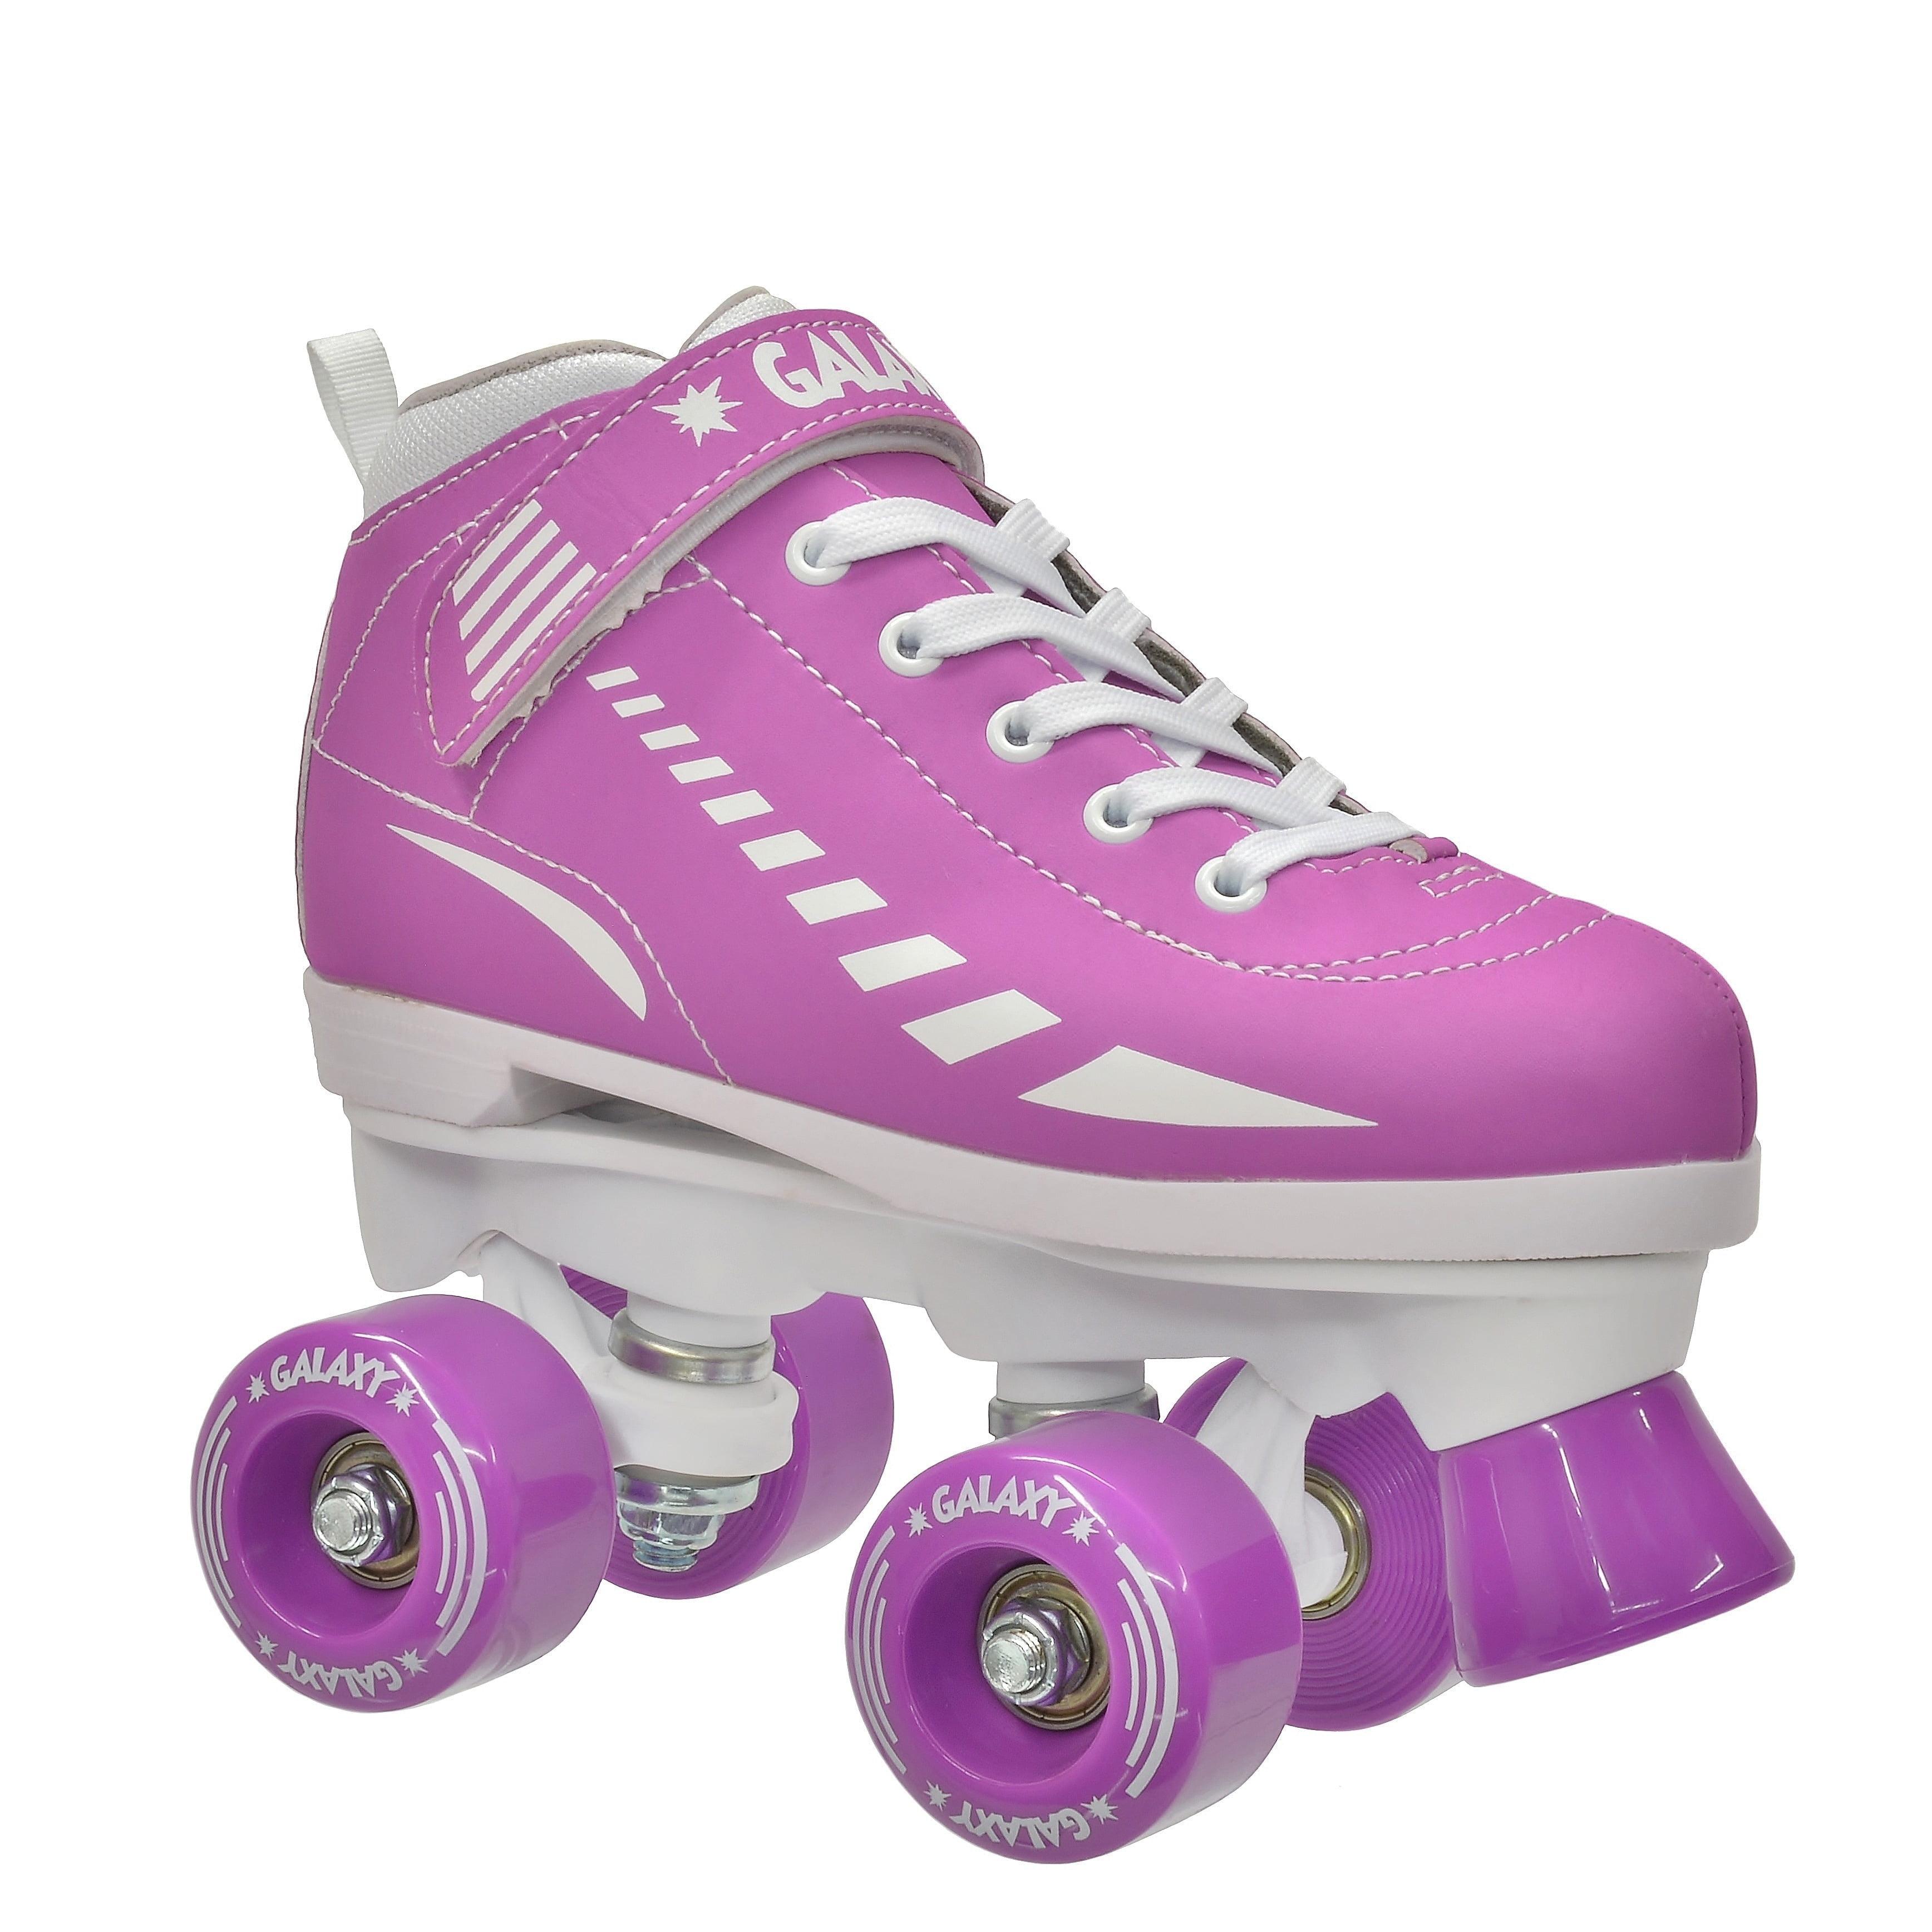 Chicago roller skates walmart - Chicago Roller Skates Walmart 16